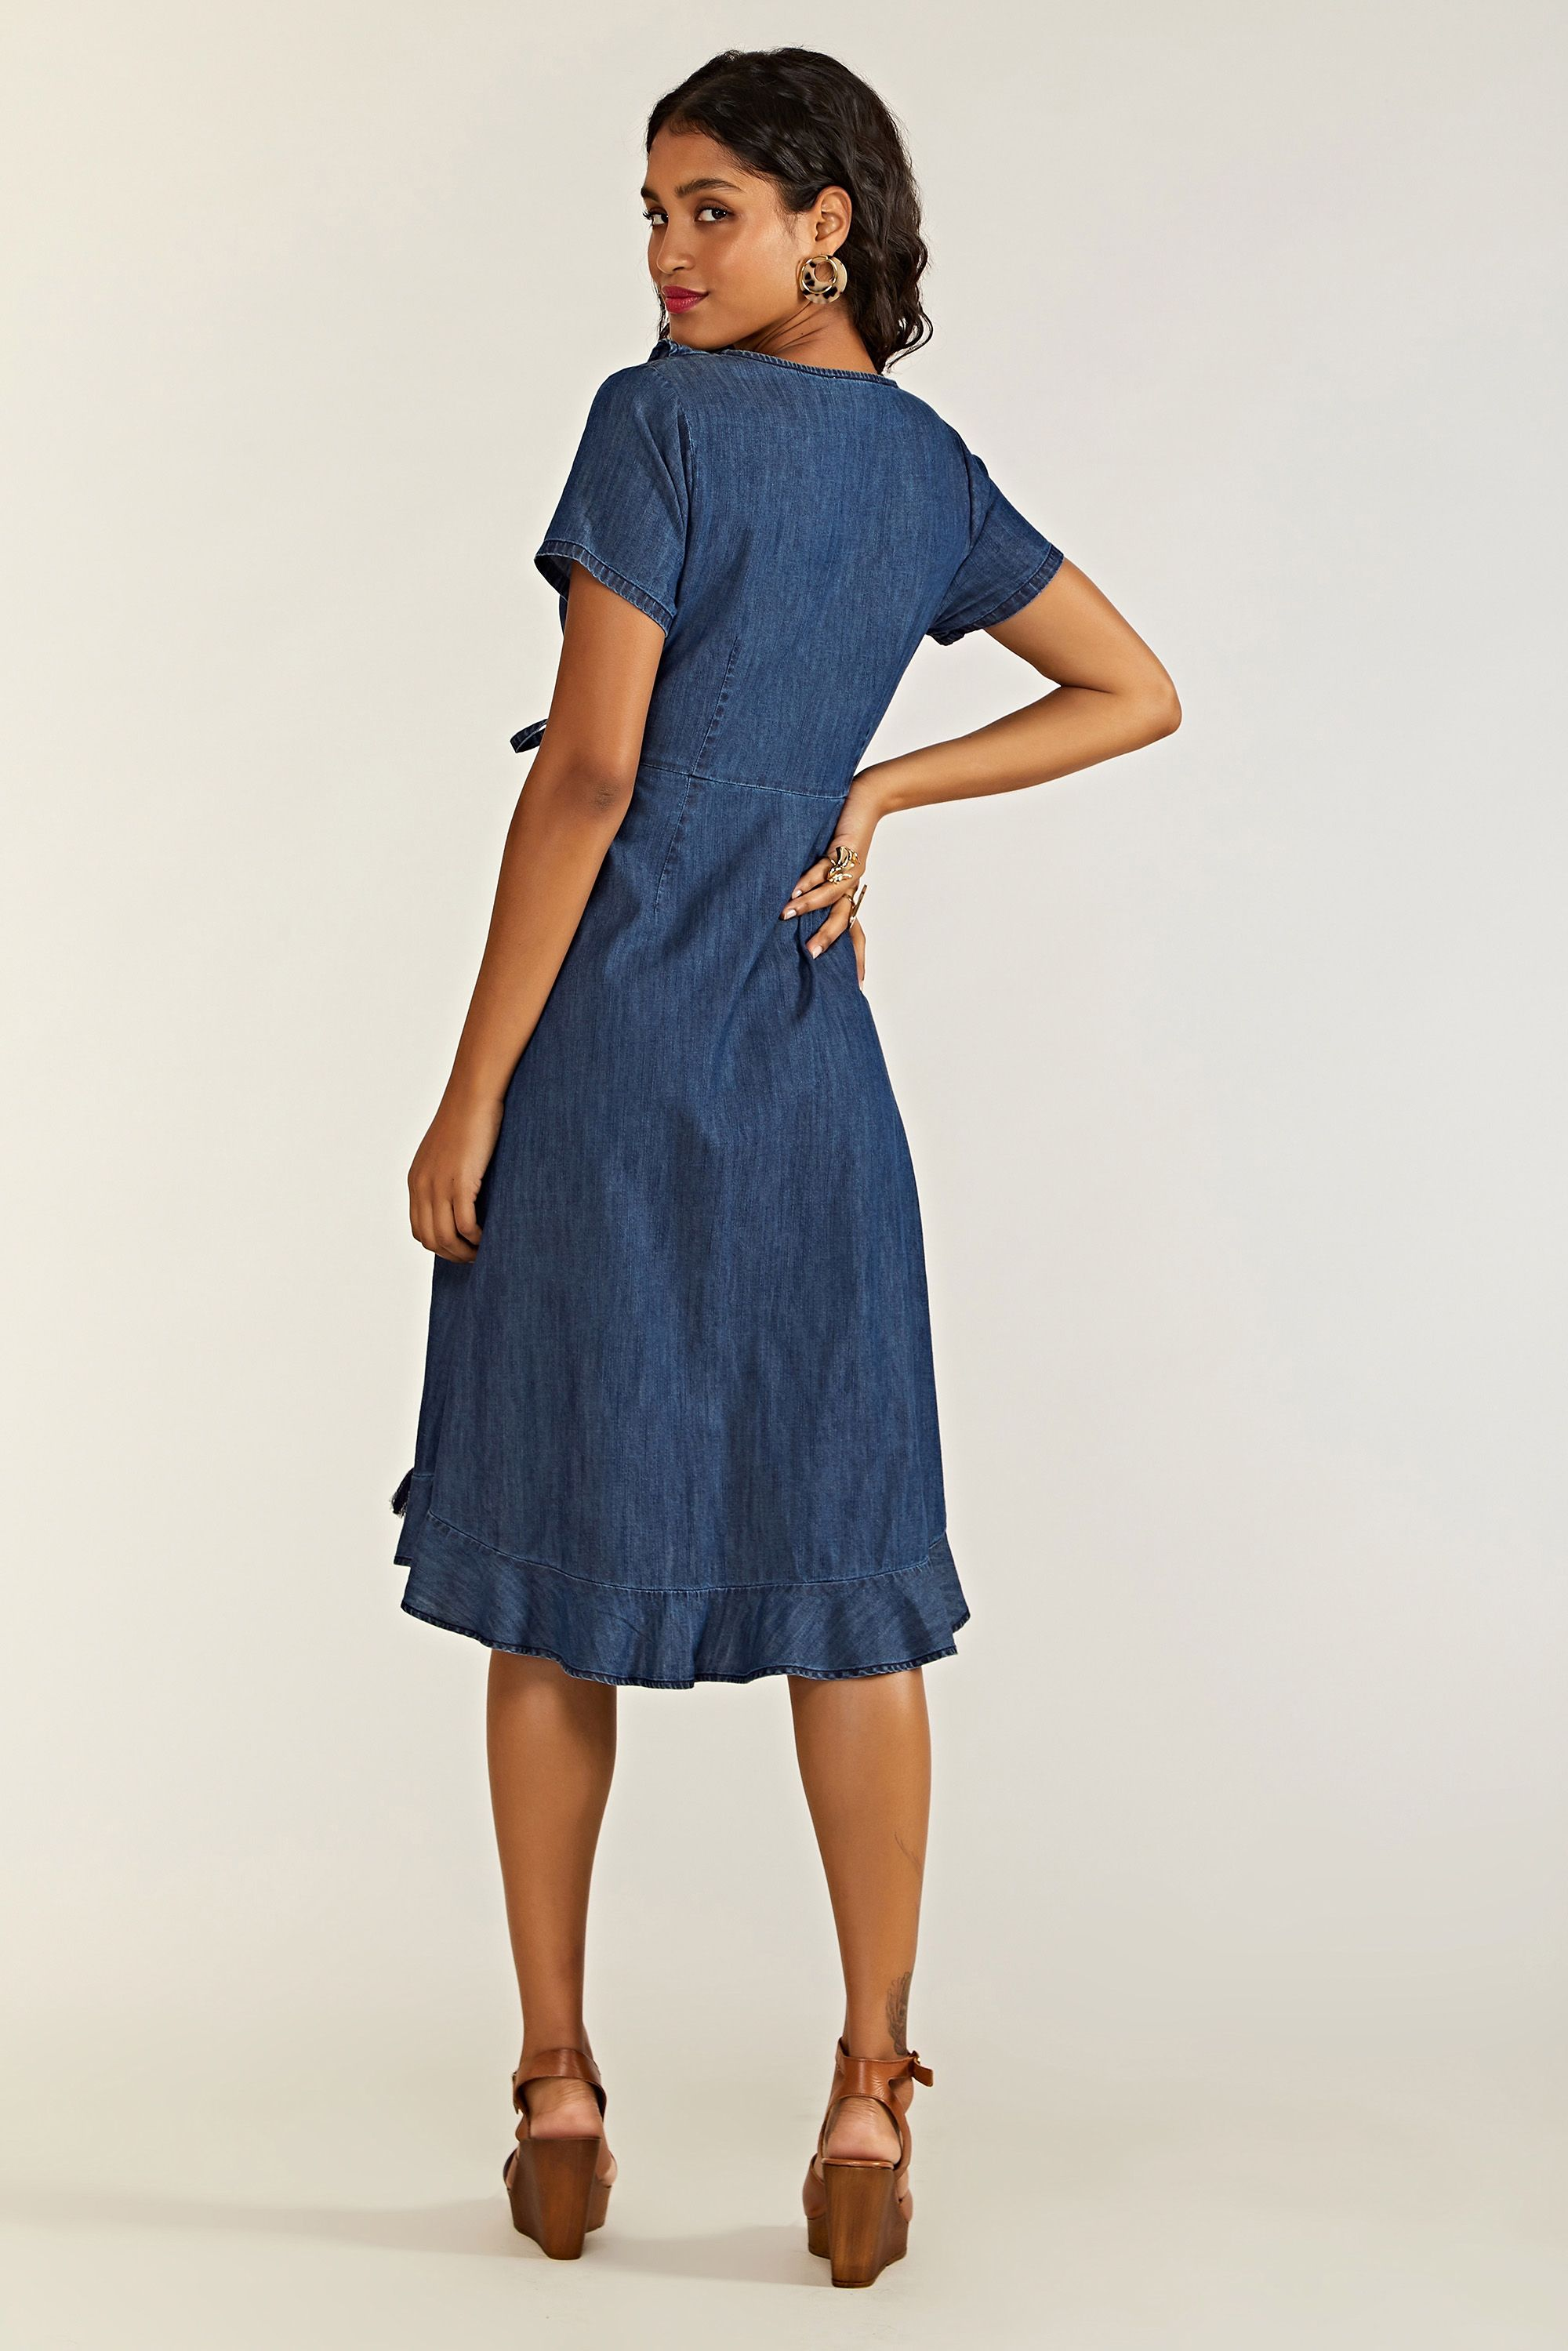 Blue Denim Wrap Dress